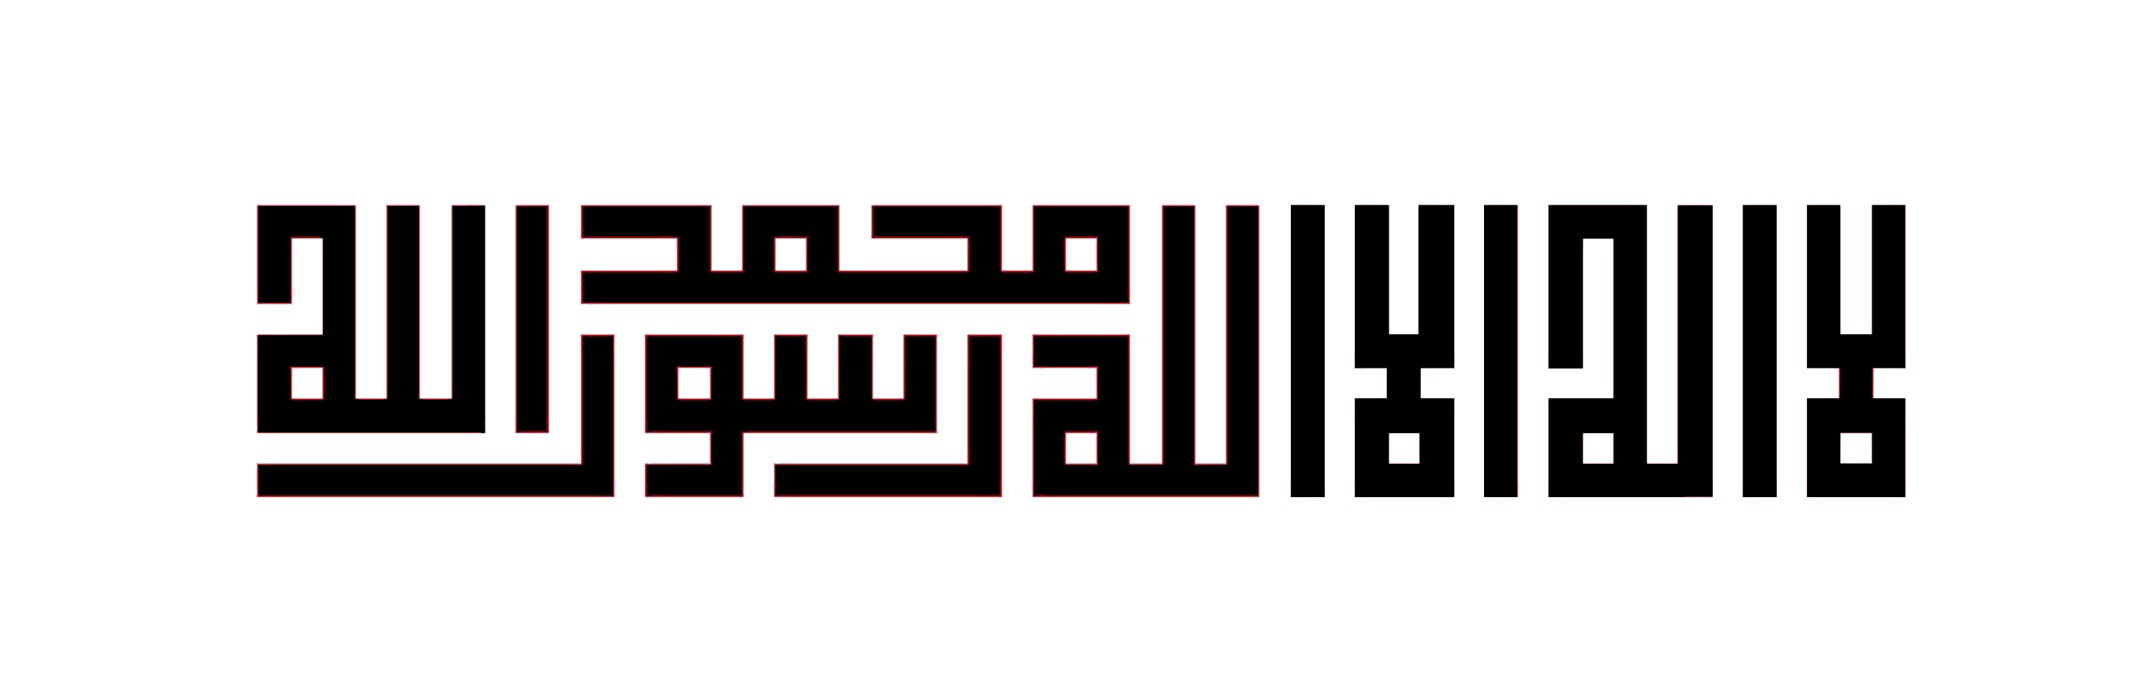 Muhammad Calligraphy Kufi The Image Kid